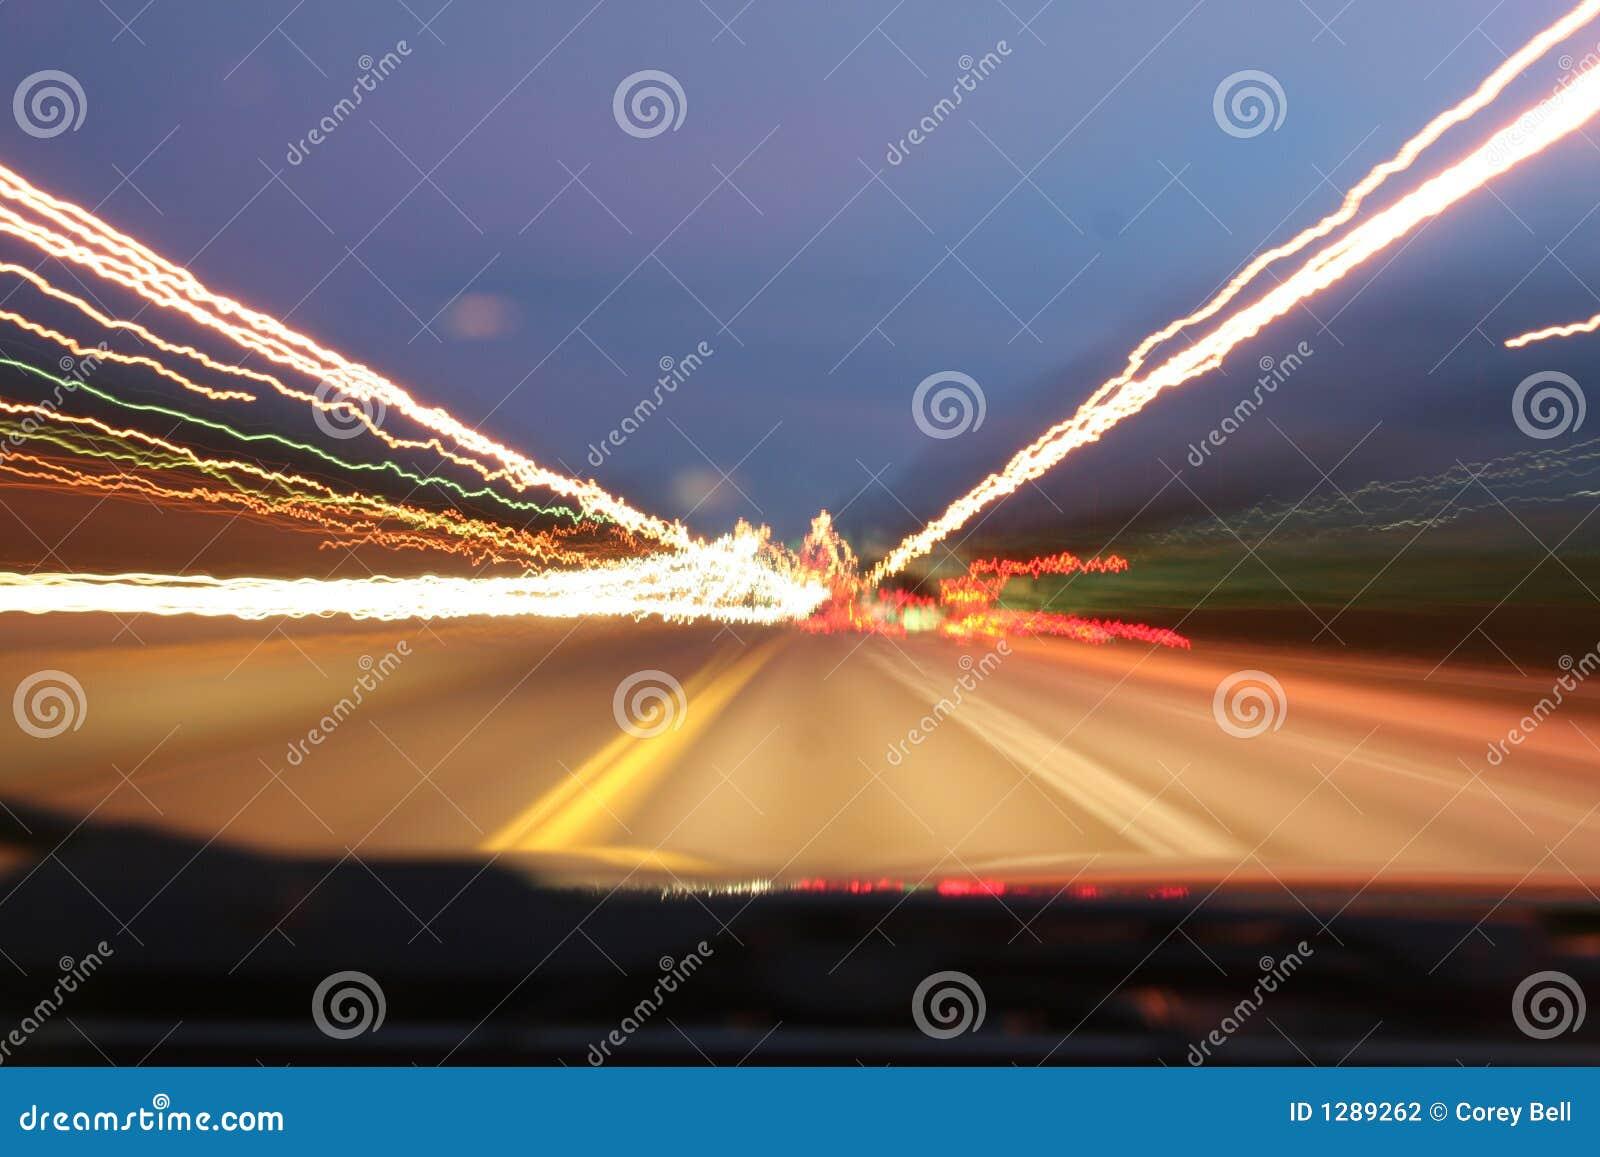 Download Luces de la carretera foto de archivo. Imagen de blur - 1289262